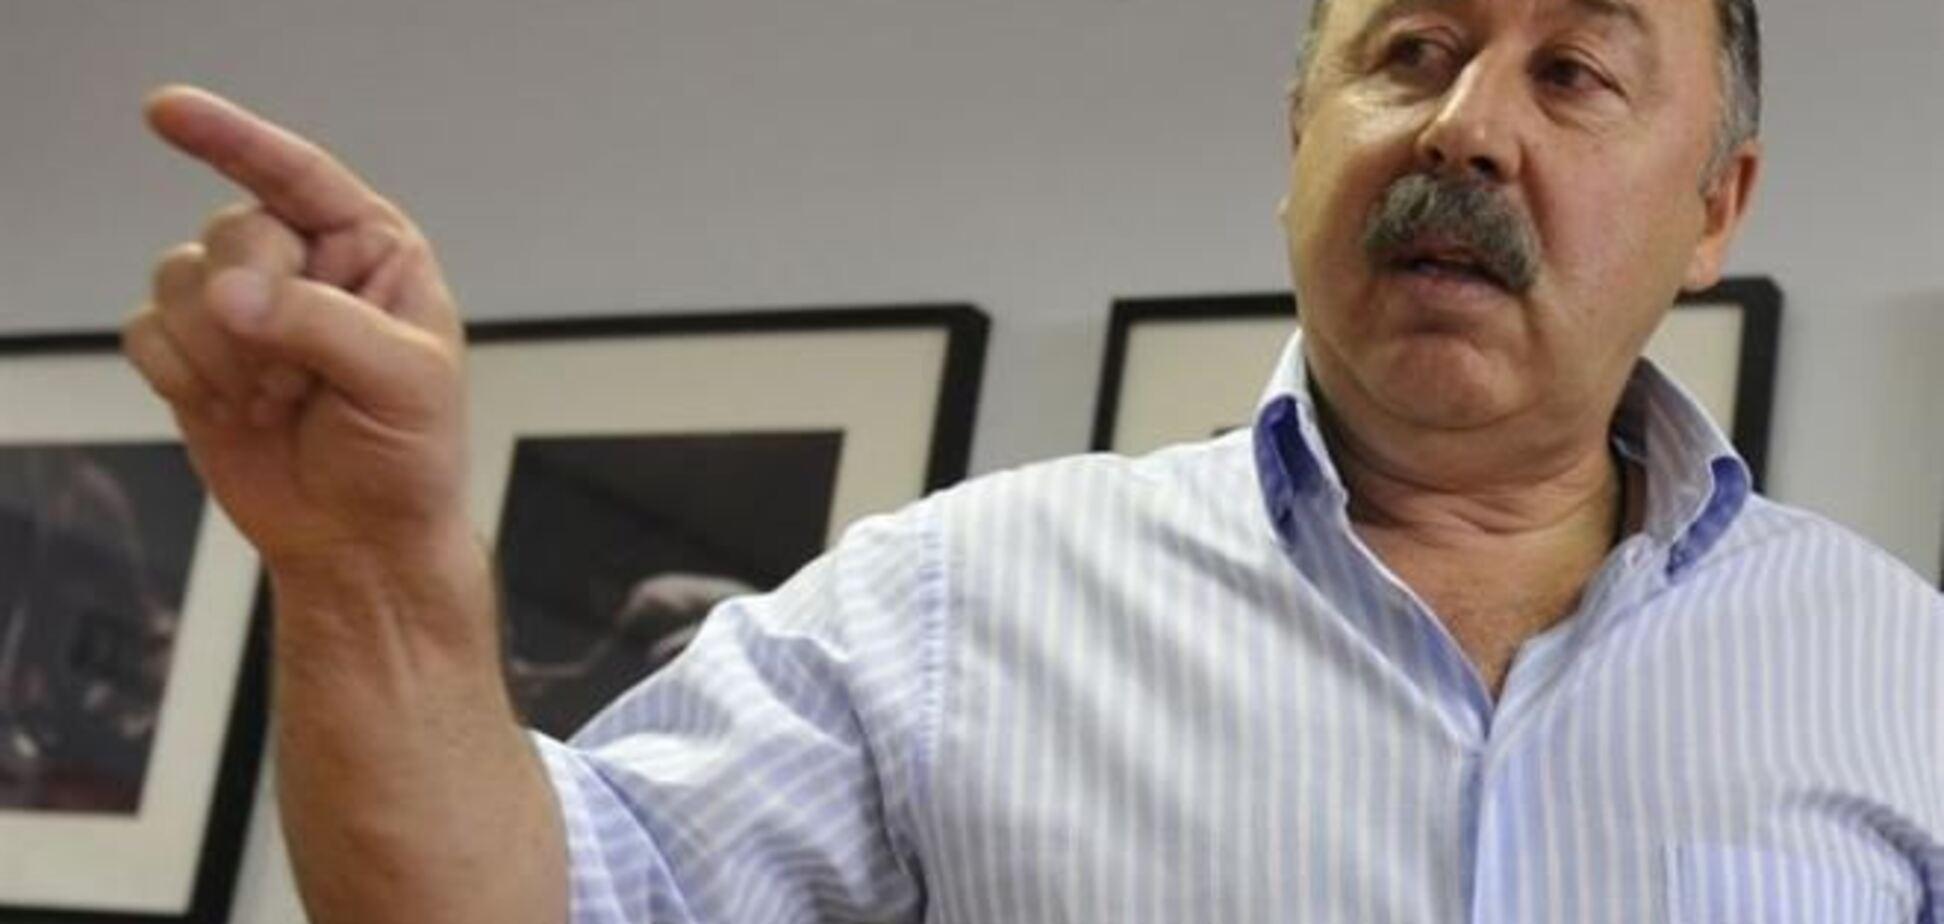 'Футболист без мозгов': Газзаев включился в травлю Вукоевича